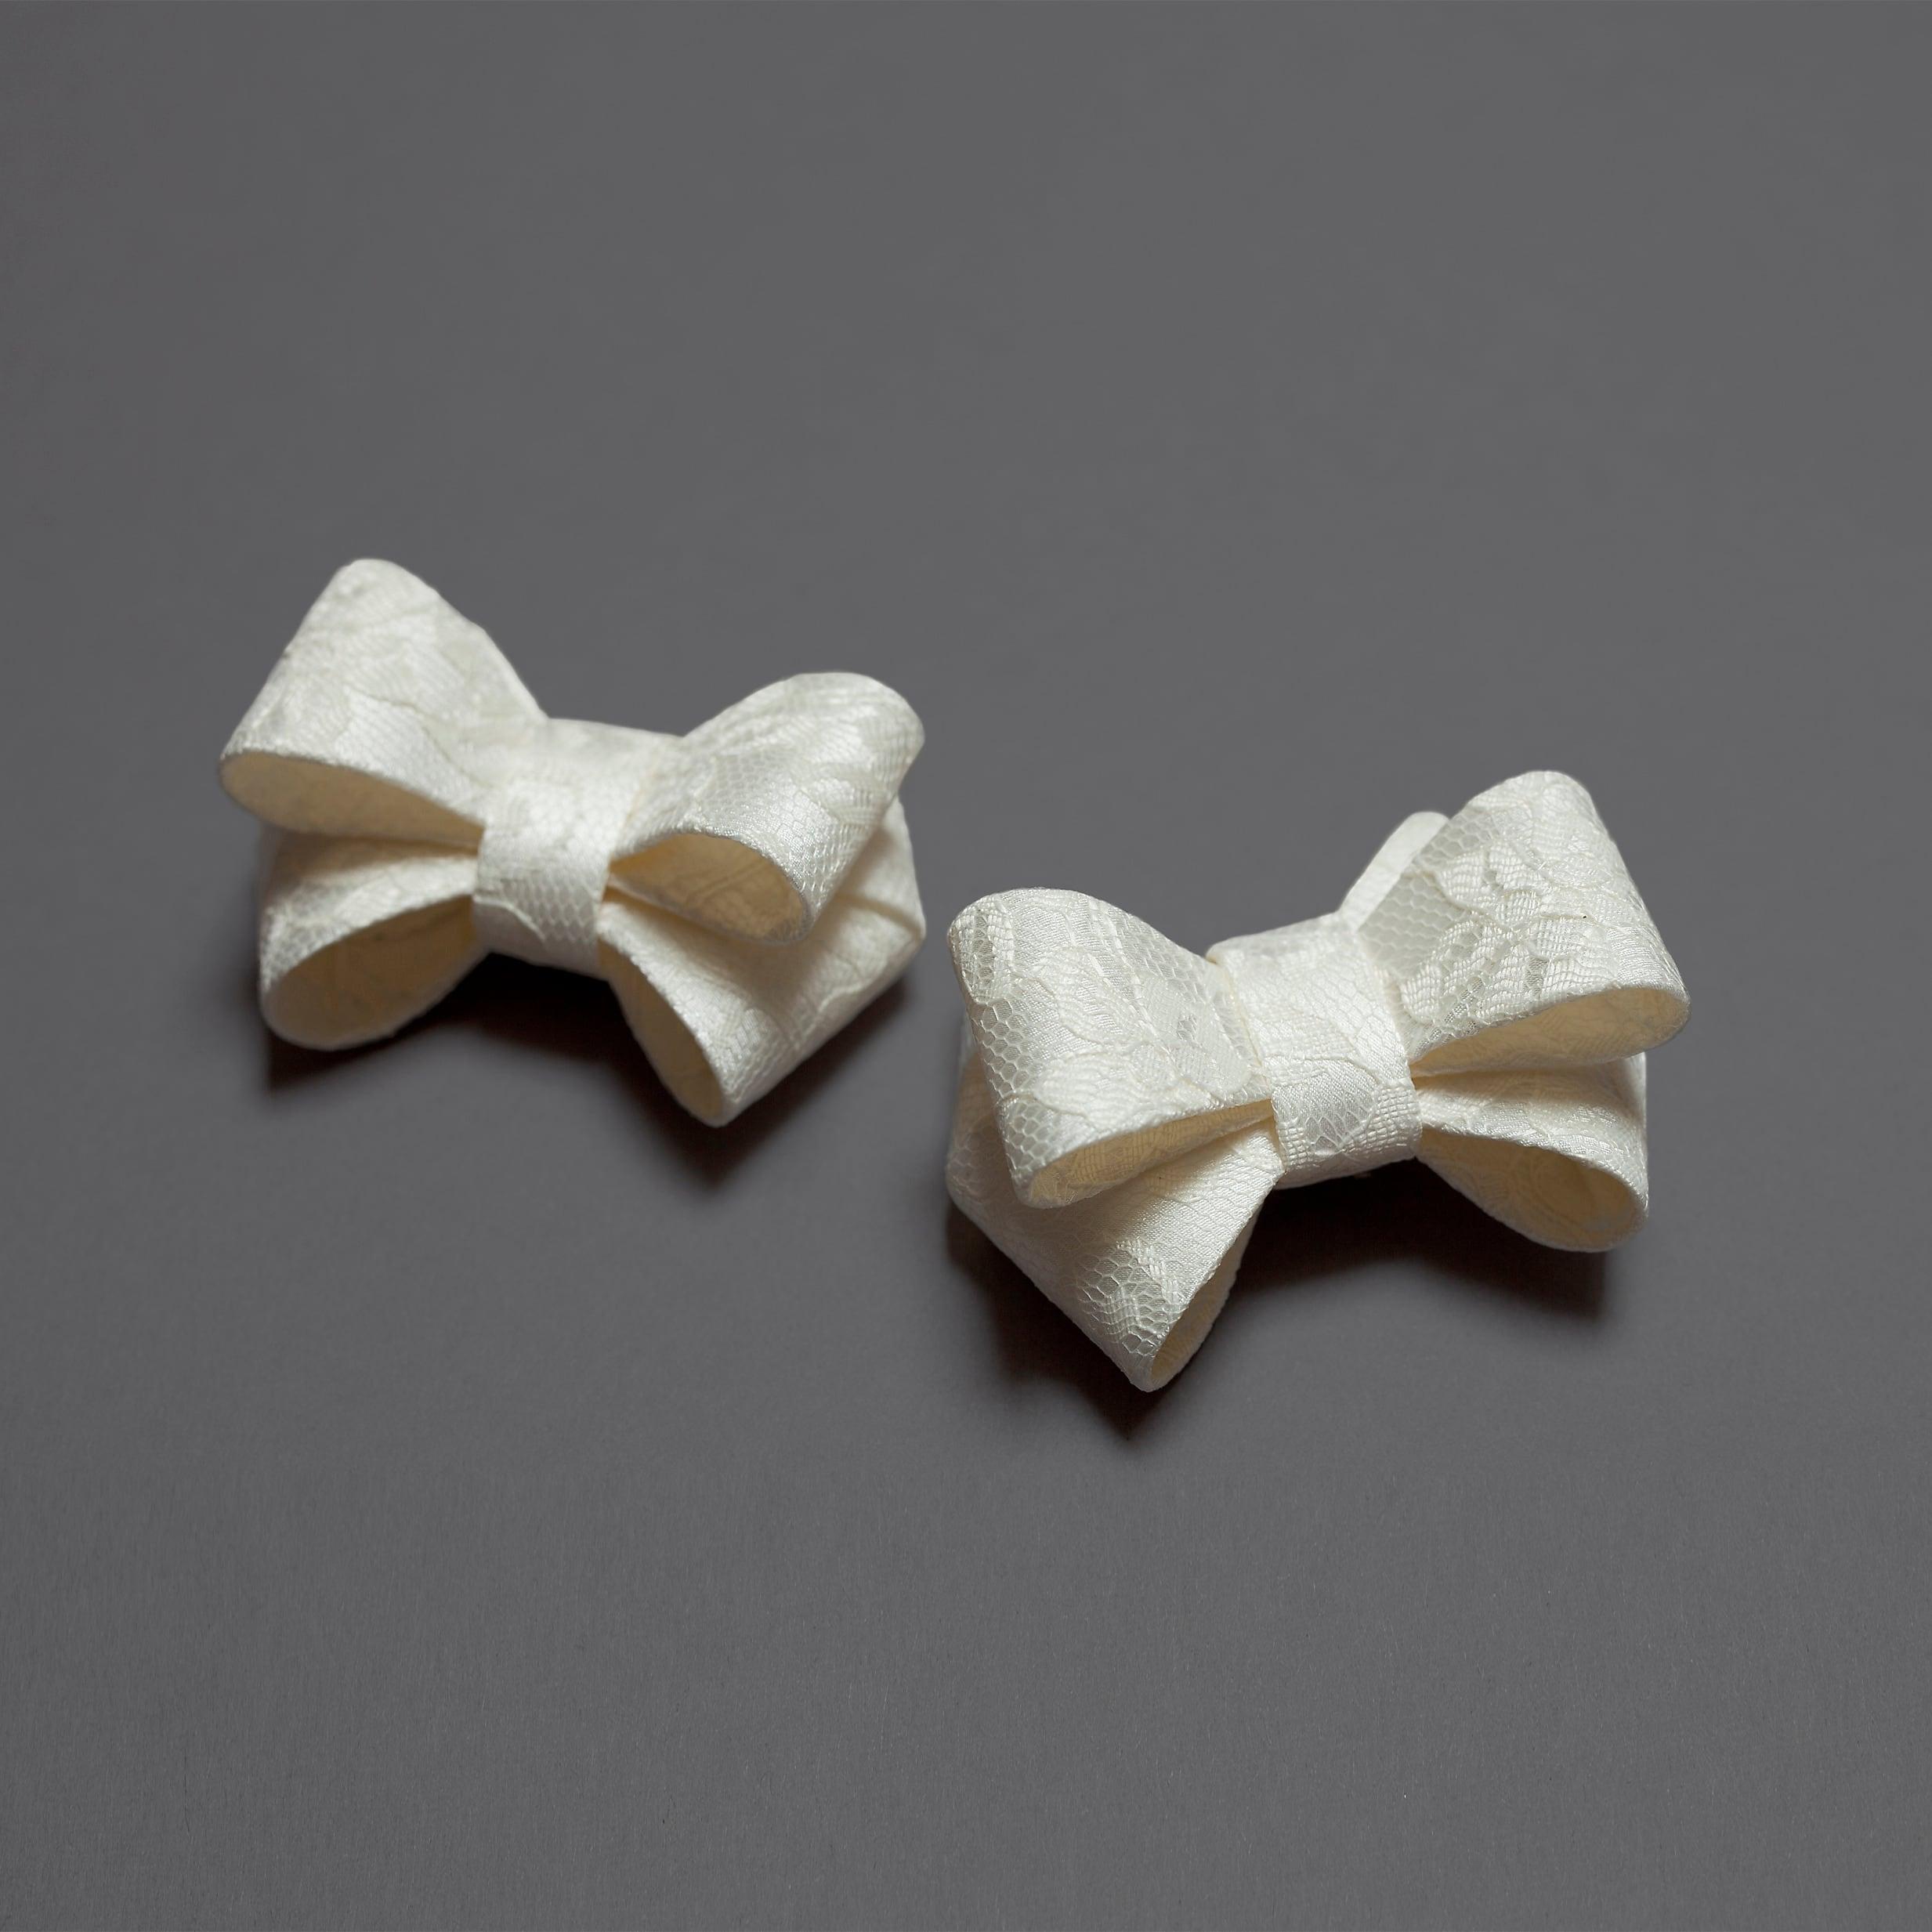 Lace / Ribbon / WH 【RRW-1 WH】